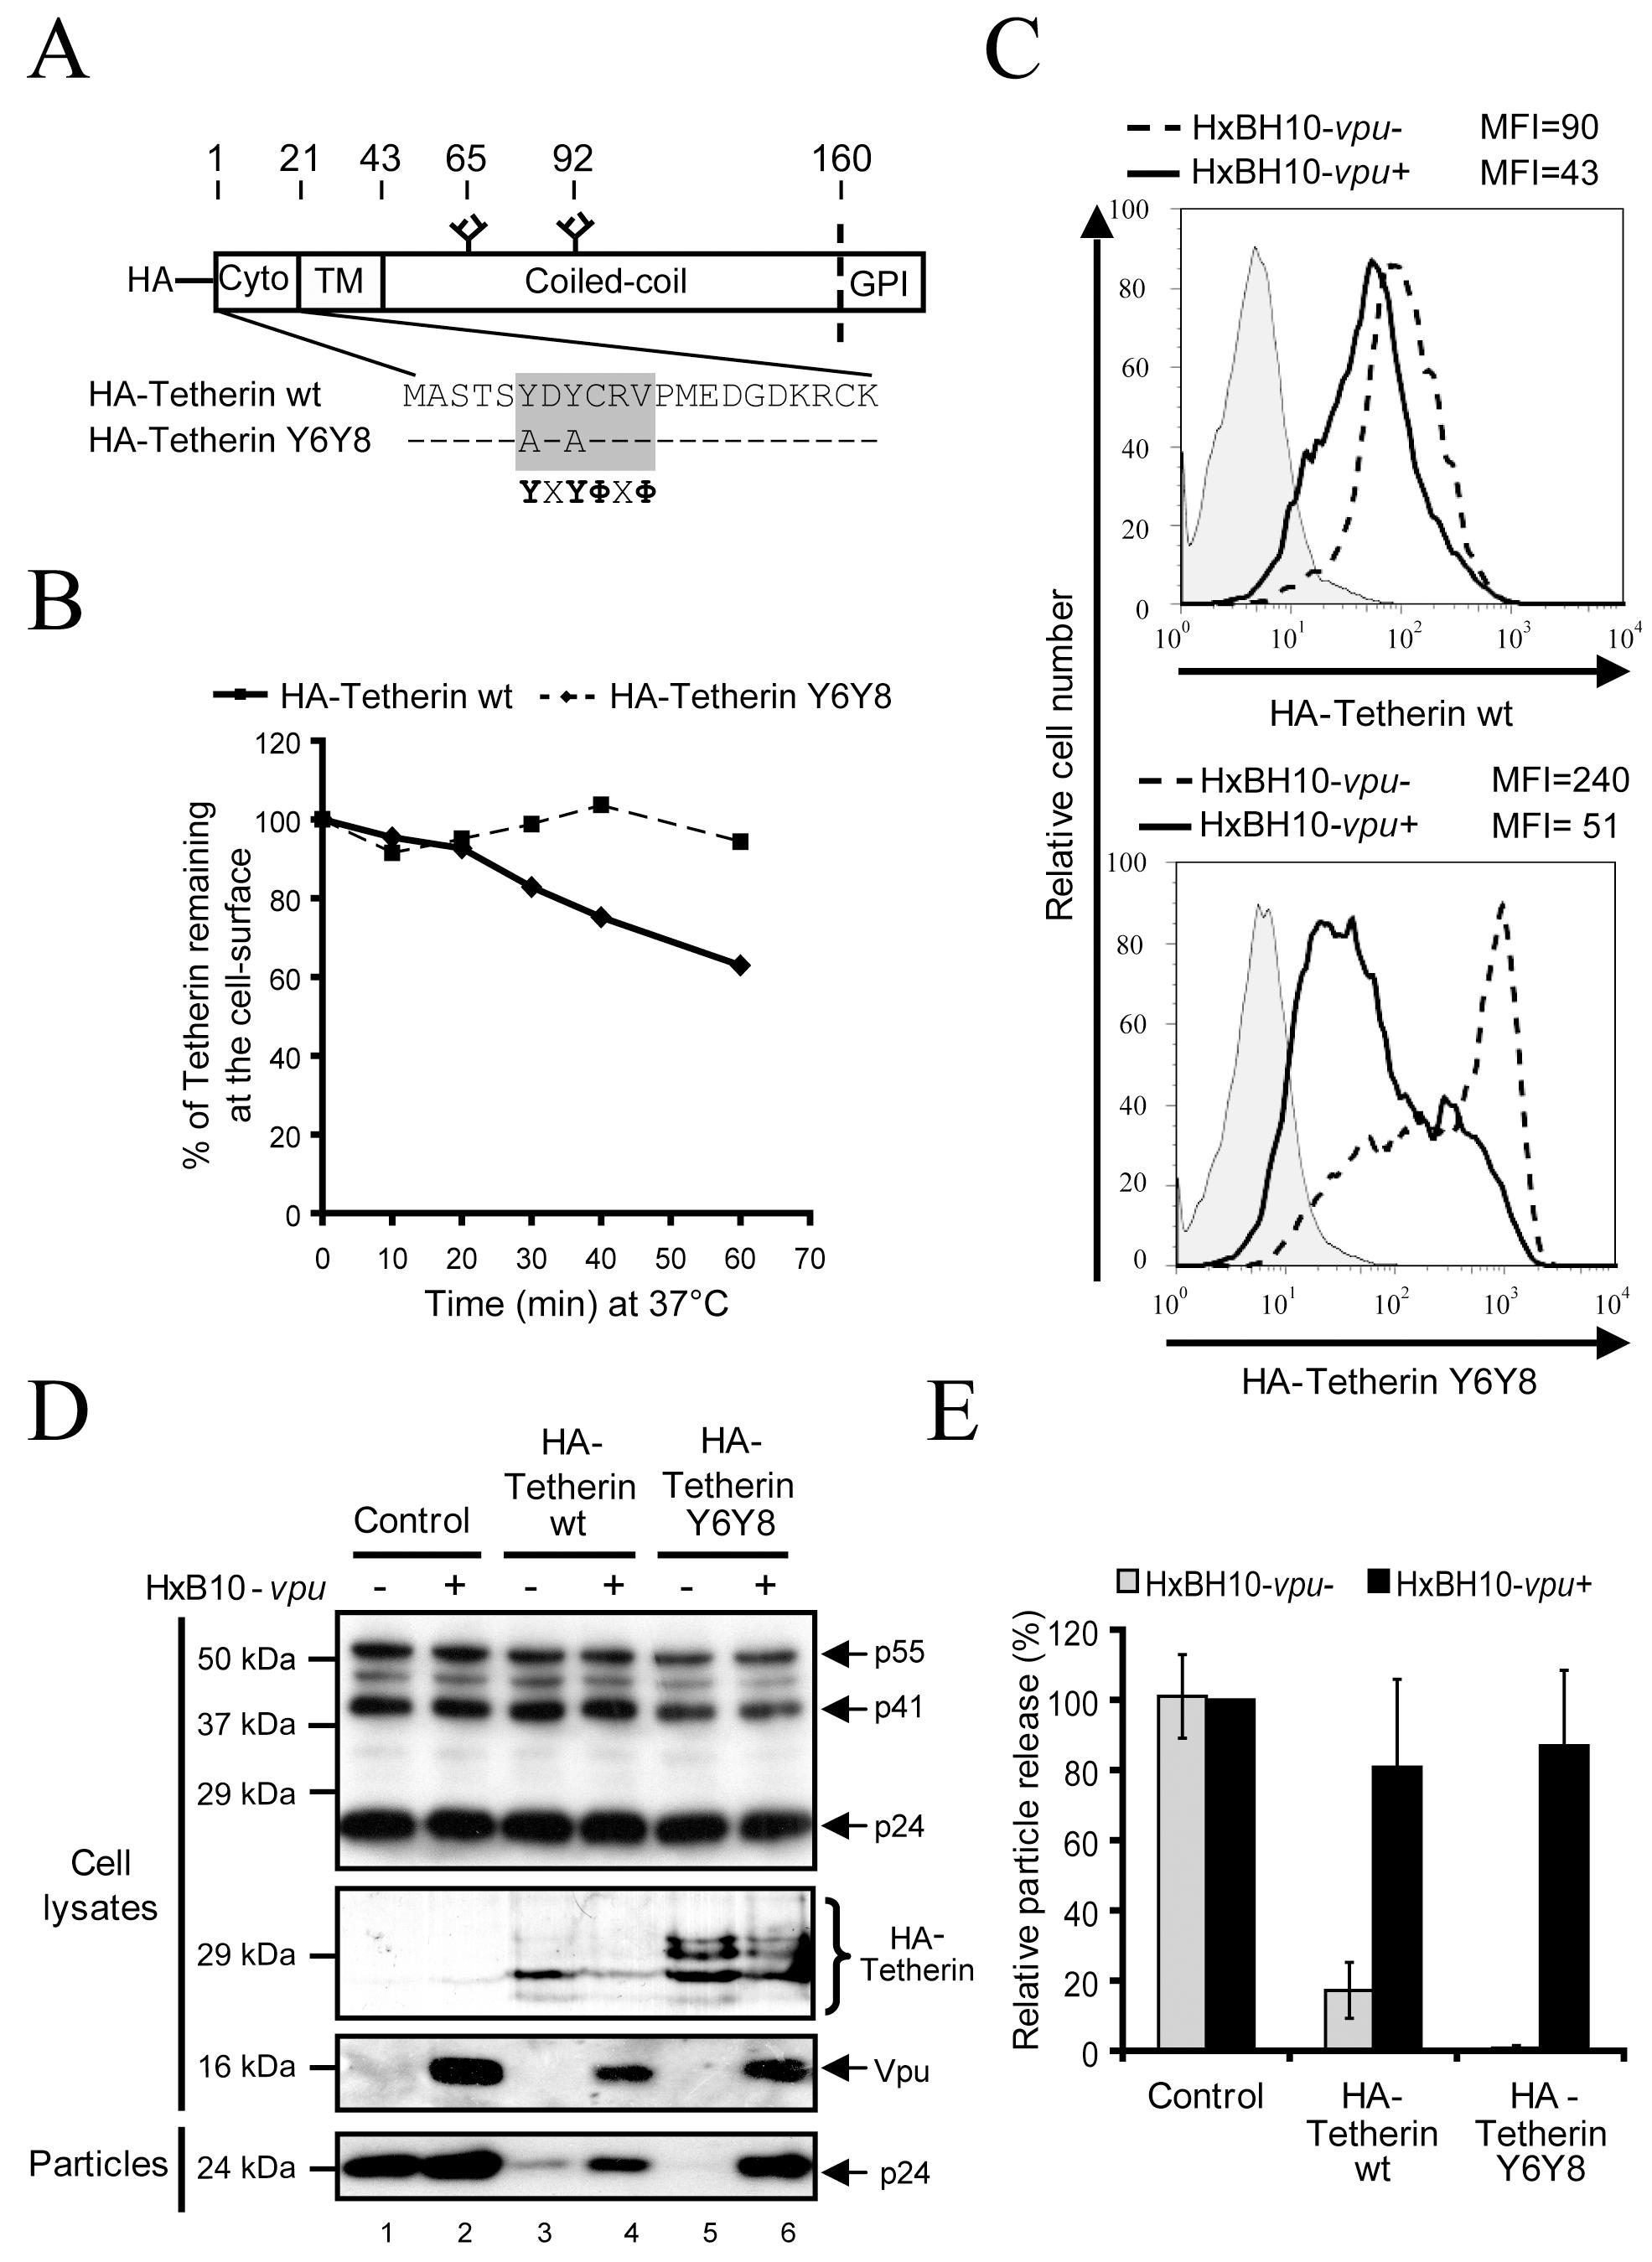 Mutation of Tetherin dual Tyrosine-based sorting motif does not affect sensitivity to Vpu.